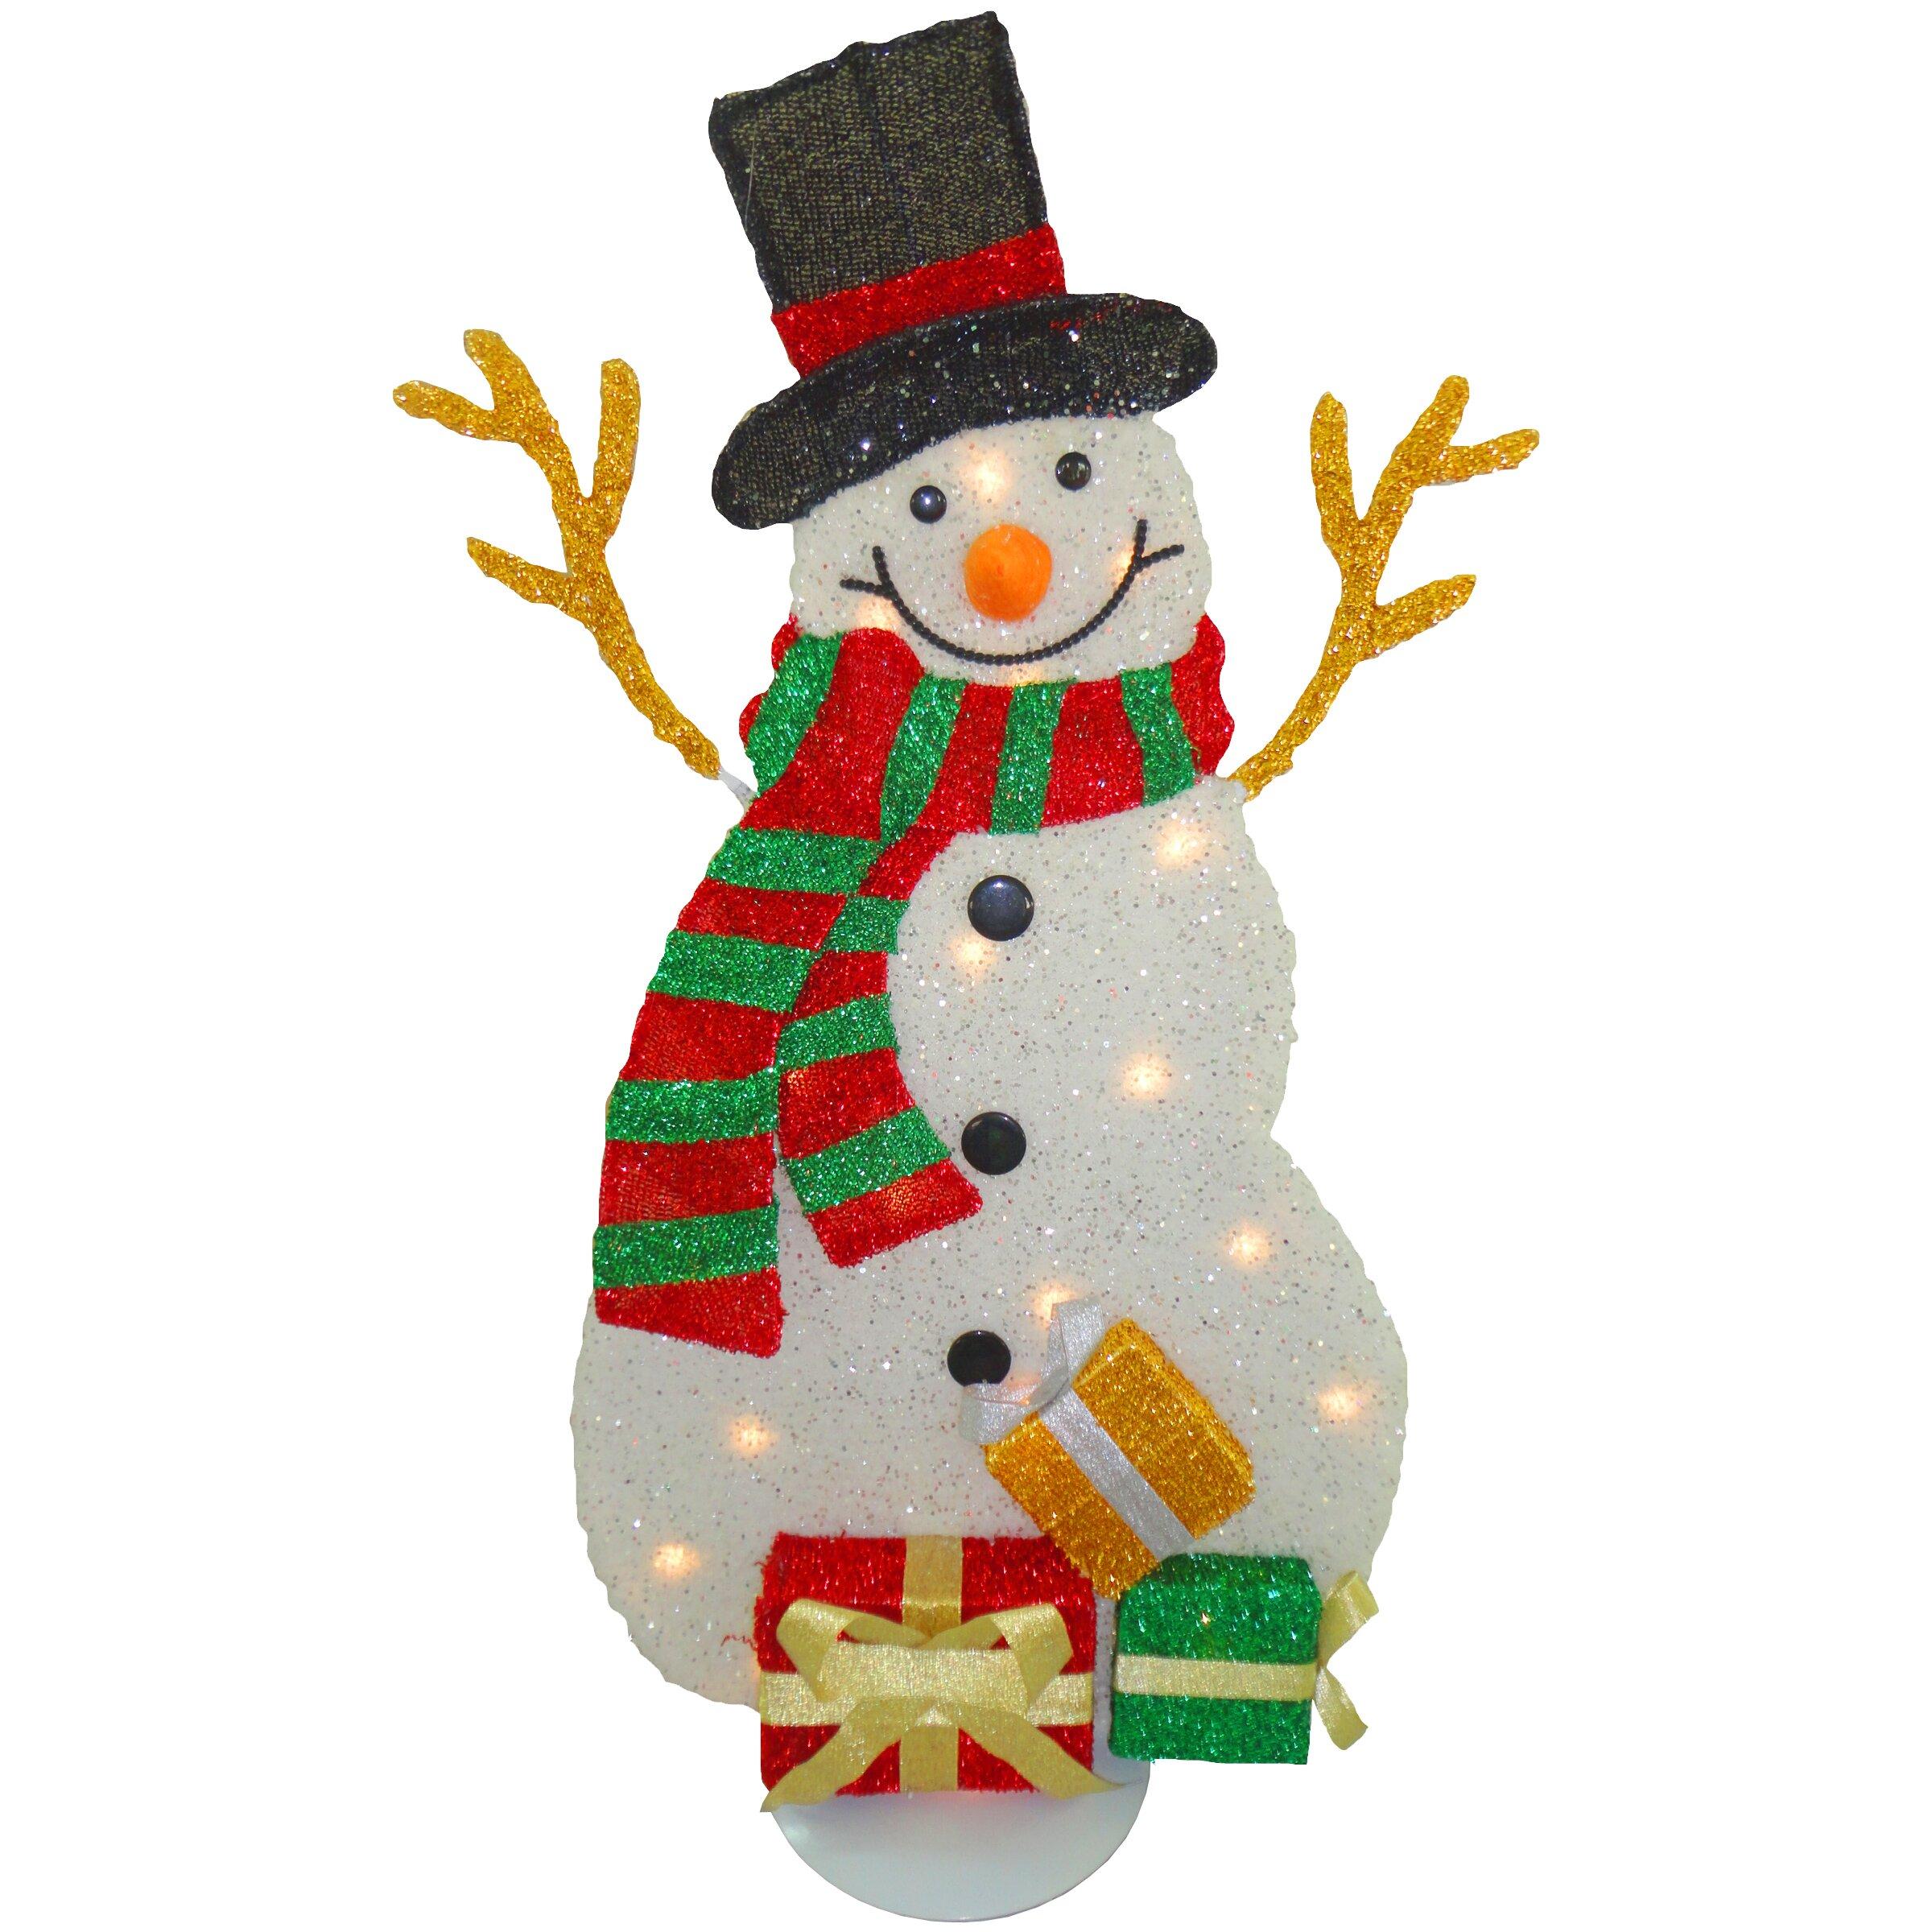 National tree co decorative d cor snowman christmas for Christmas snowman decorations